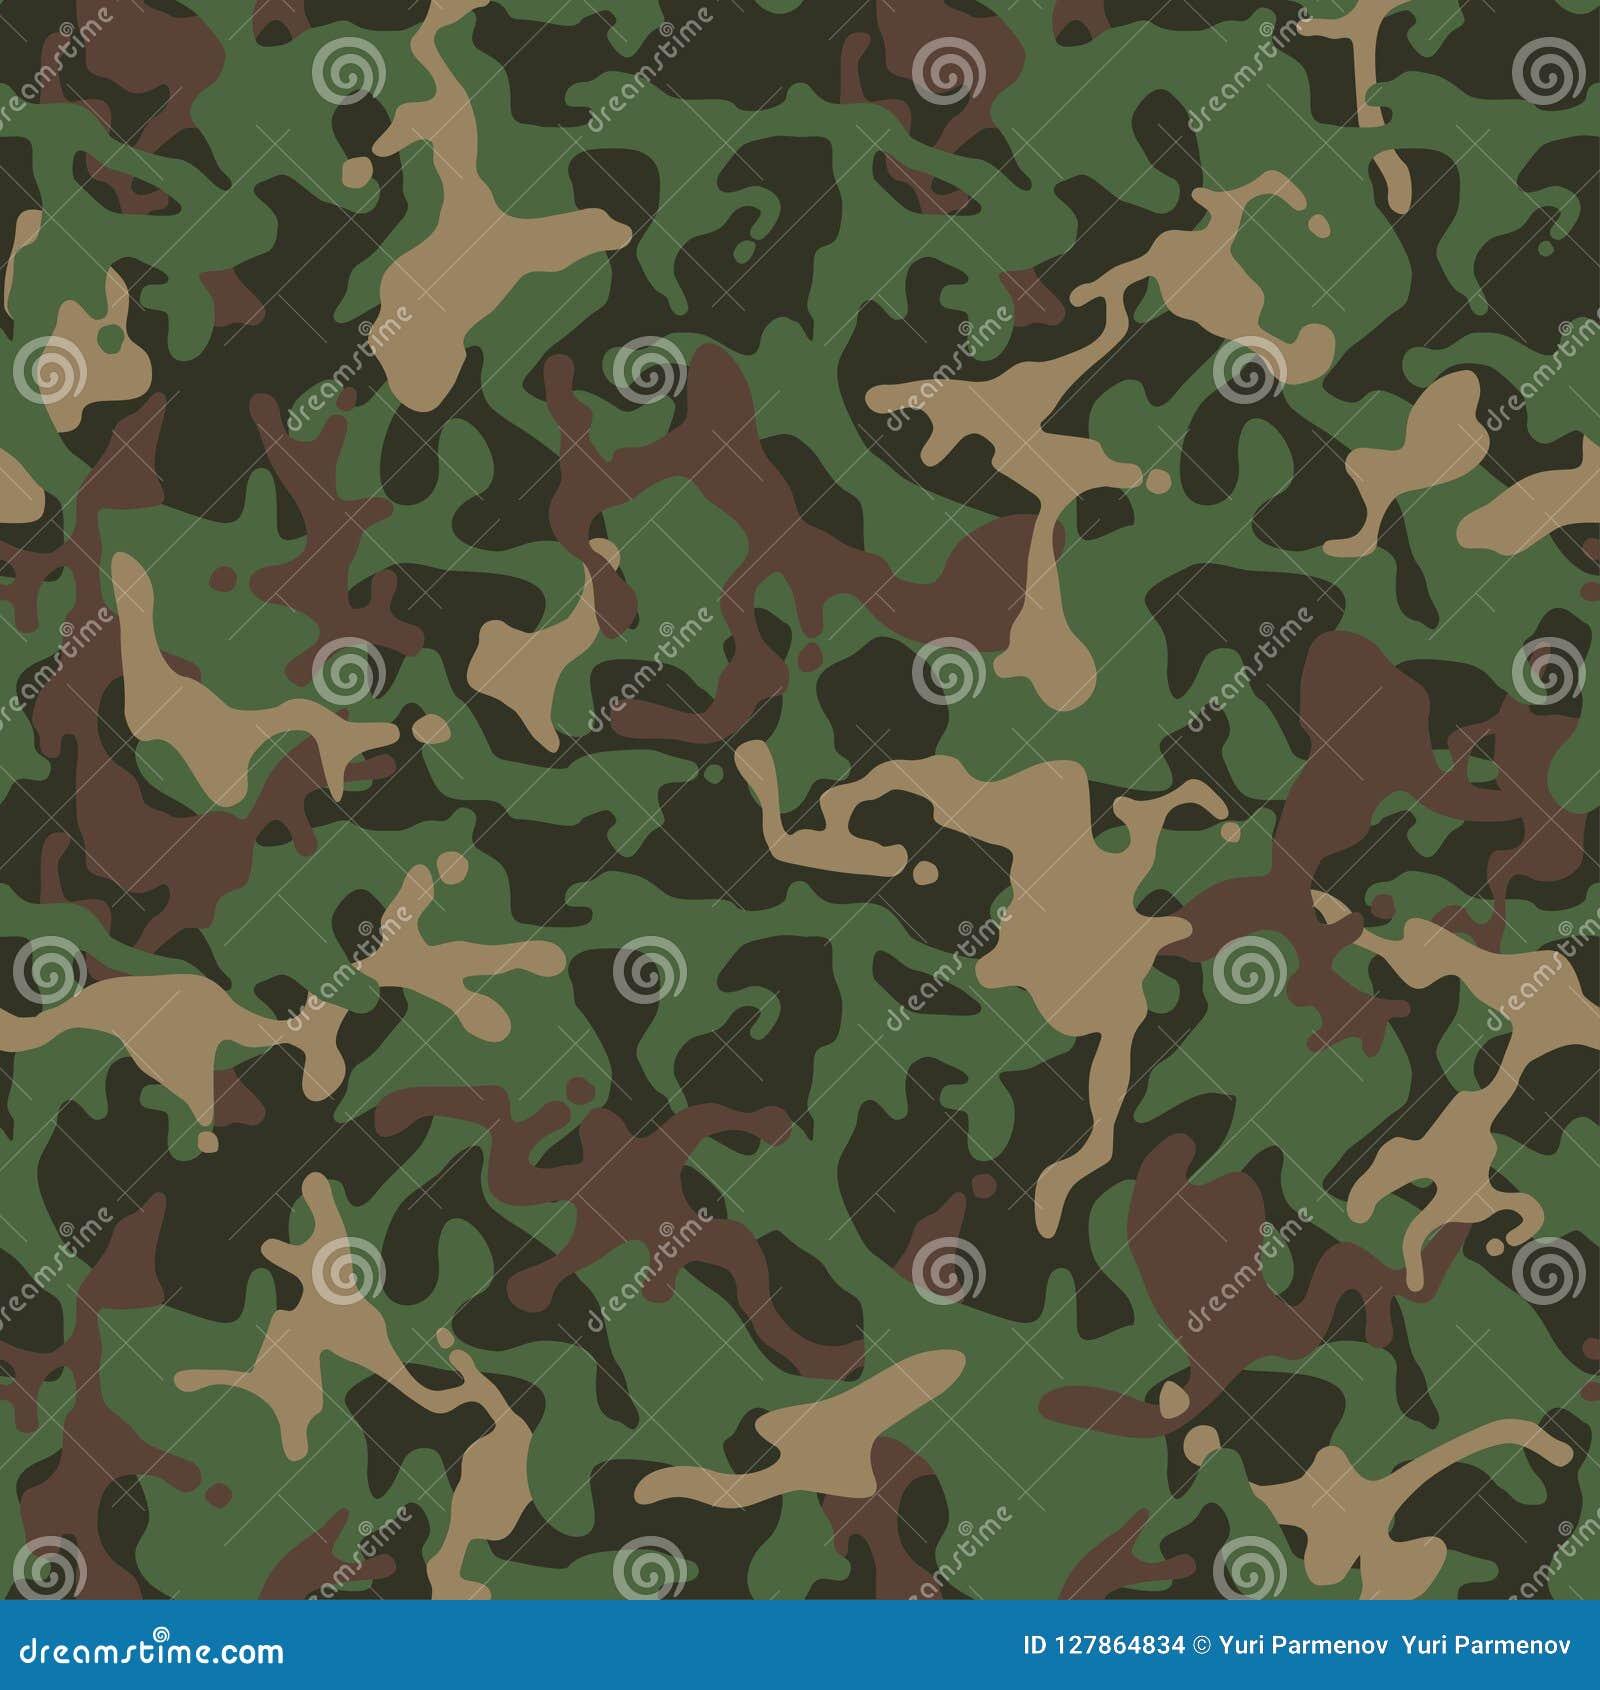 c4ea3c8c3e6 πρότυπο κάλυψης Πράσινη στρατιωτική στολή Σύσταση Camo Διανυσματική ...